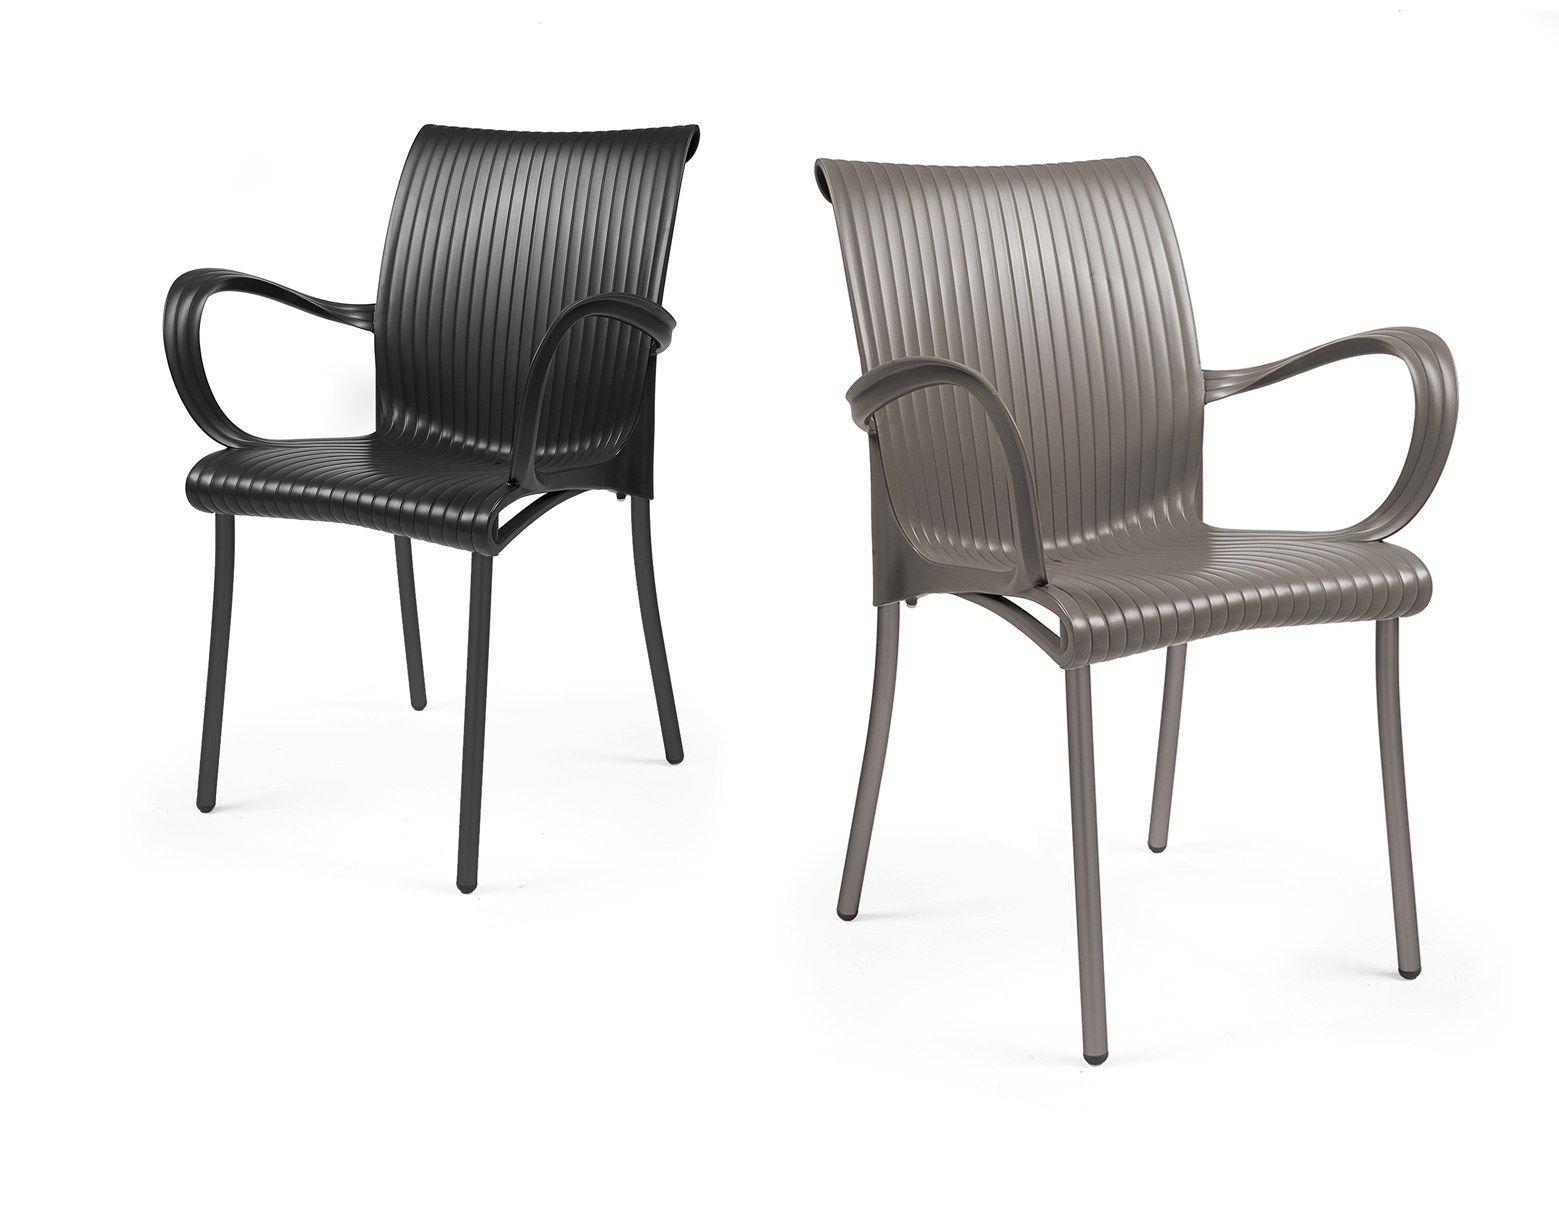 chaise de jardin empilable de style contemporain avec accoudoirs dama by nardi design raffaello. Black Bedroom Furniture Sets. Home Design Ideas